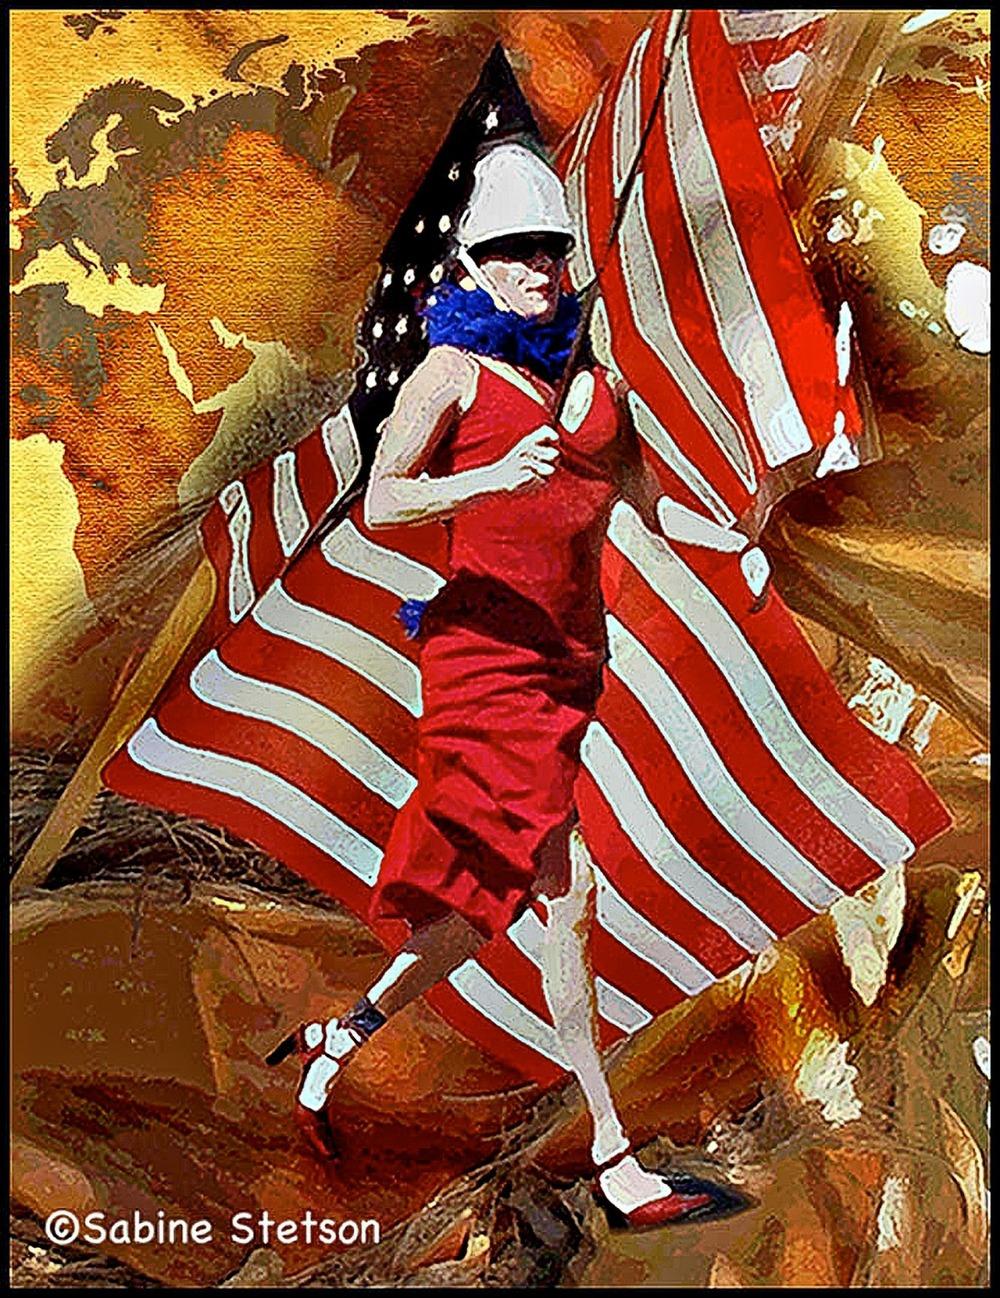 lady+liberty+-+sabine+stetson.jpg